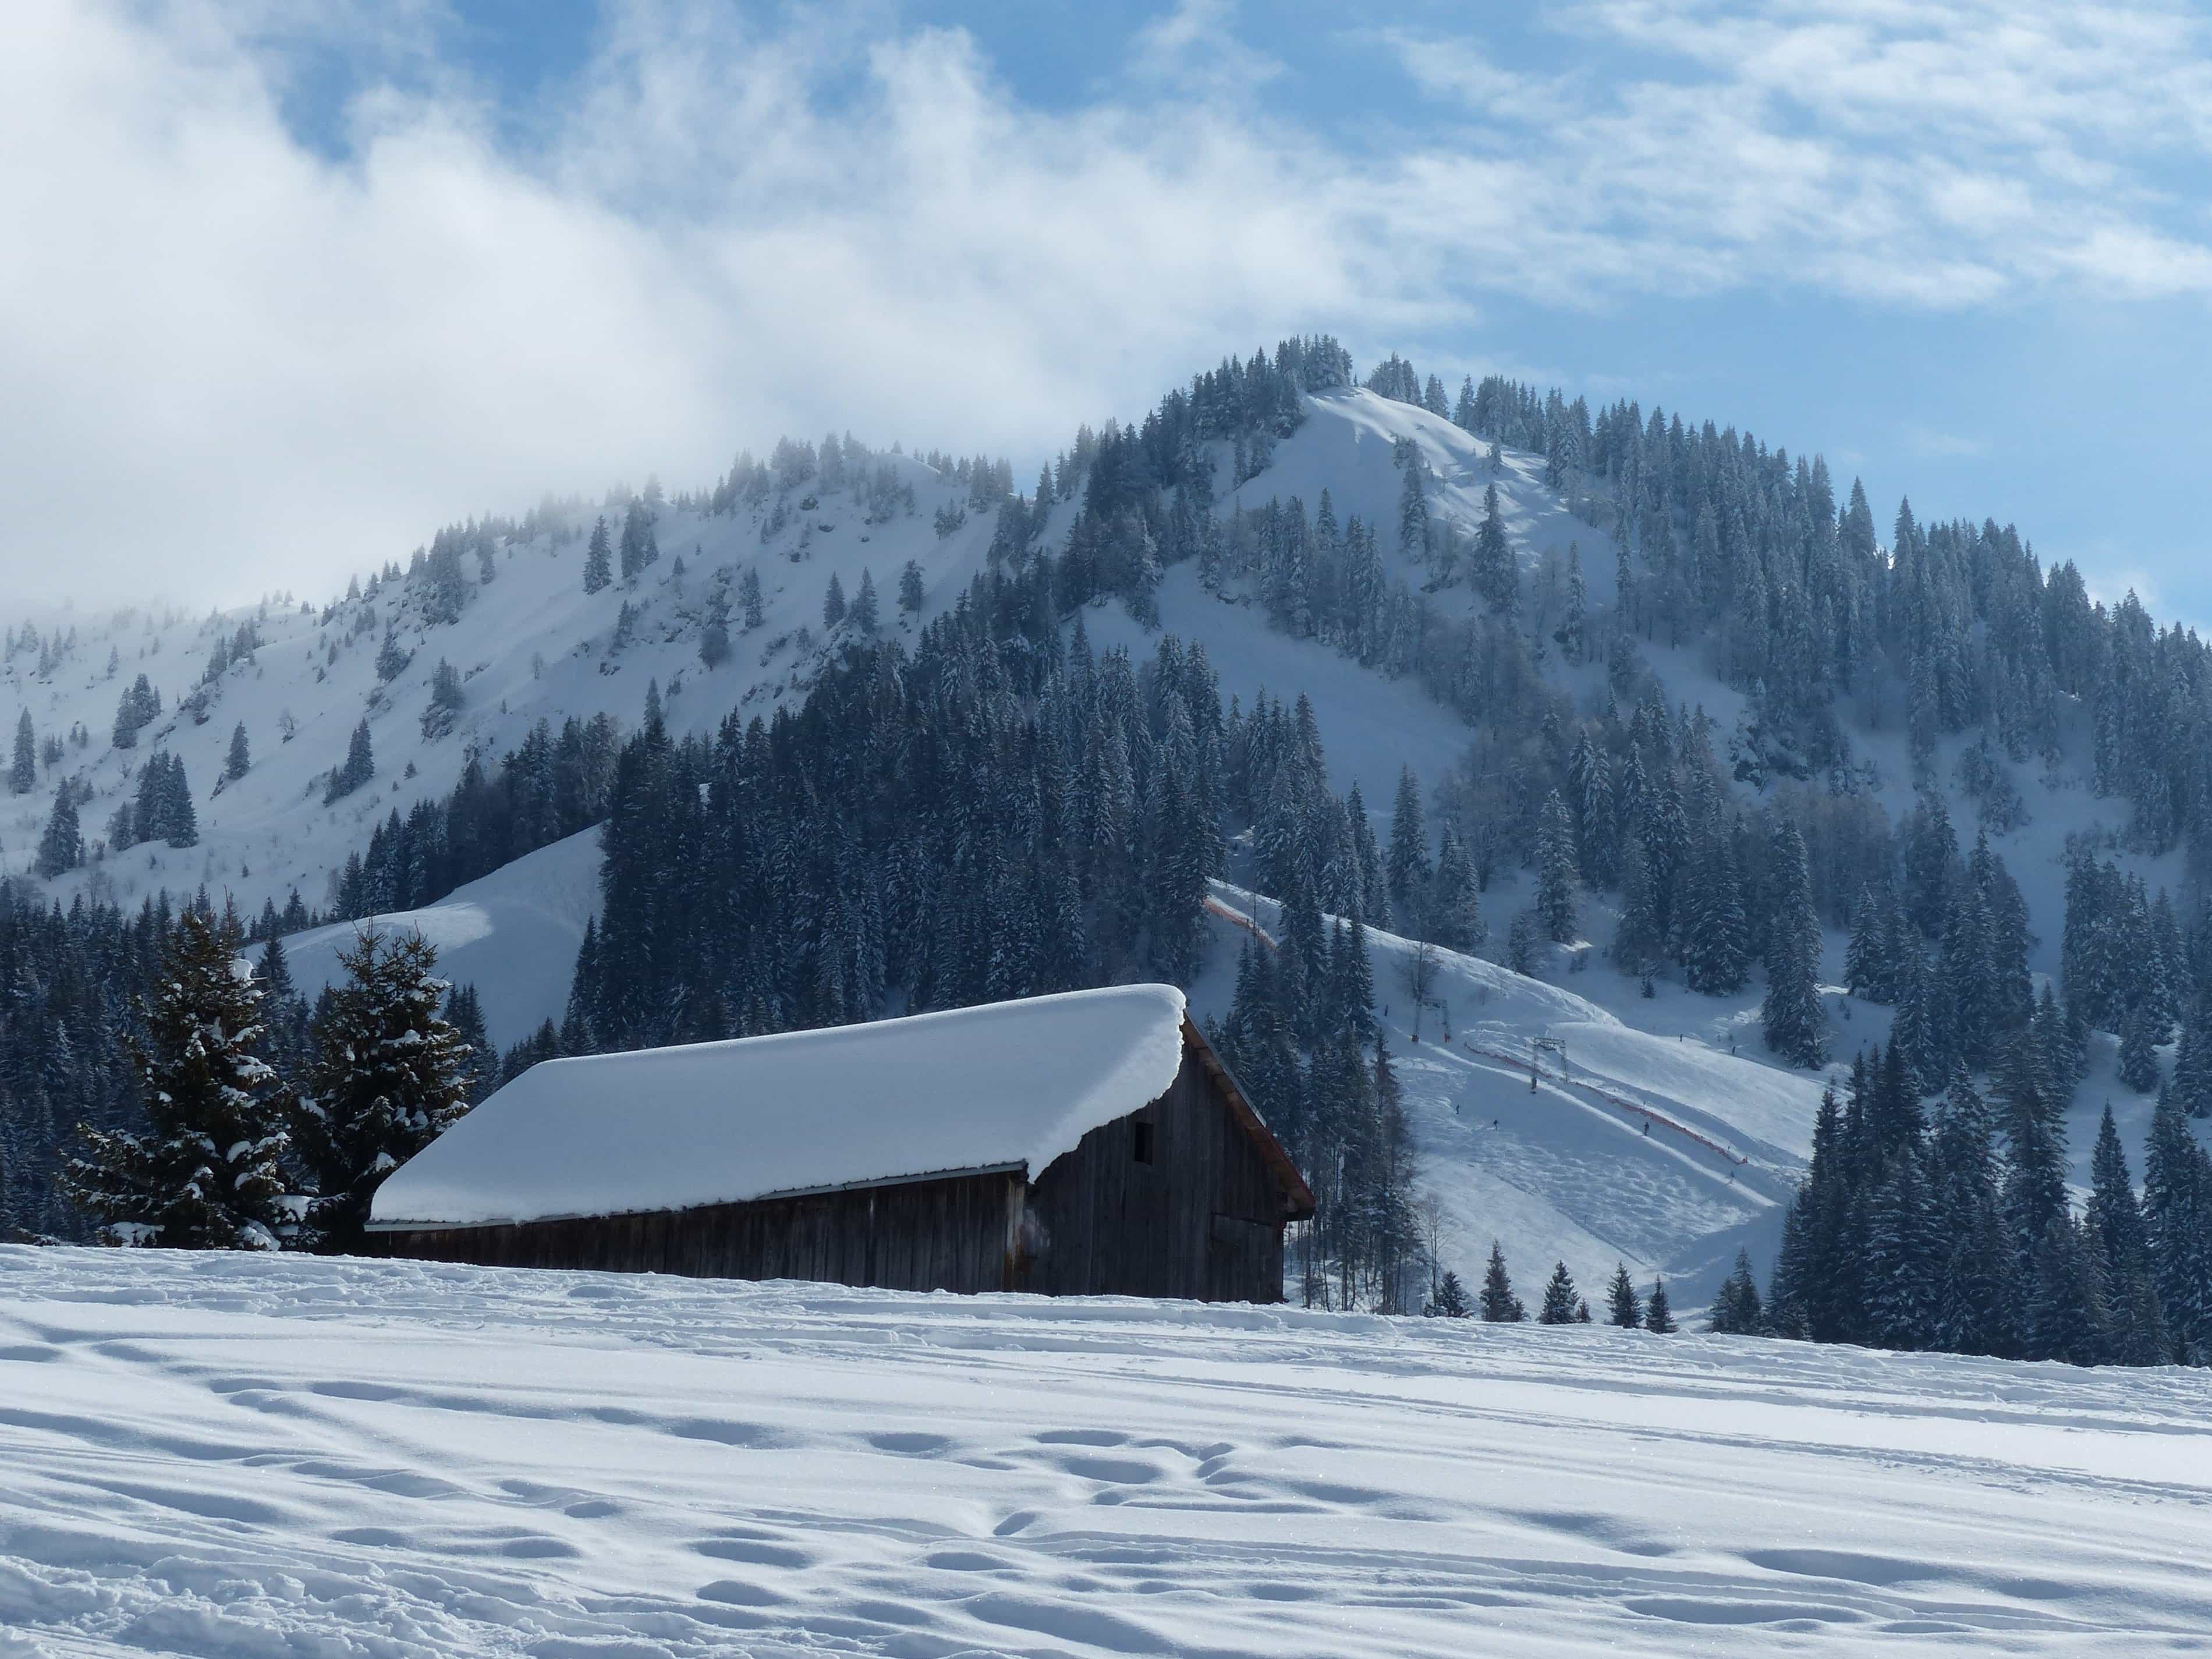 Imagen gratis: nieve, altitud, paisaje, invierno, montaña, frío ...